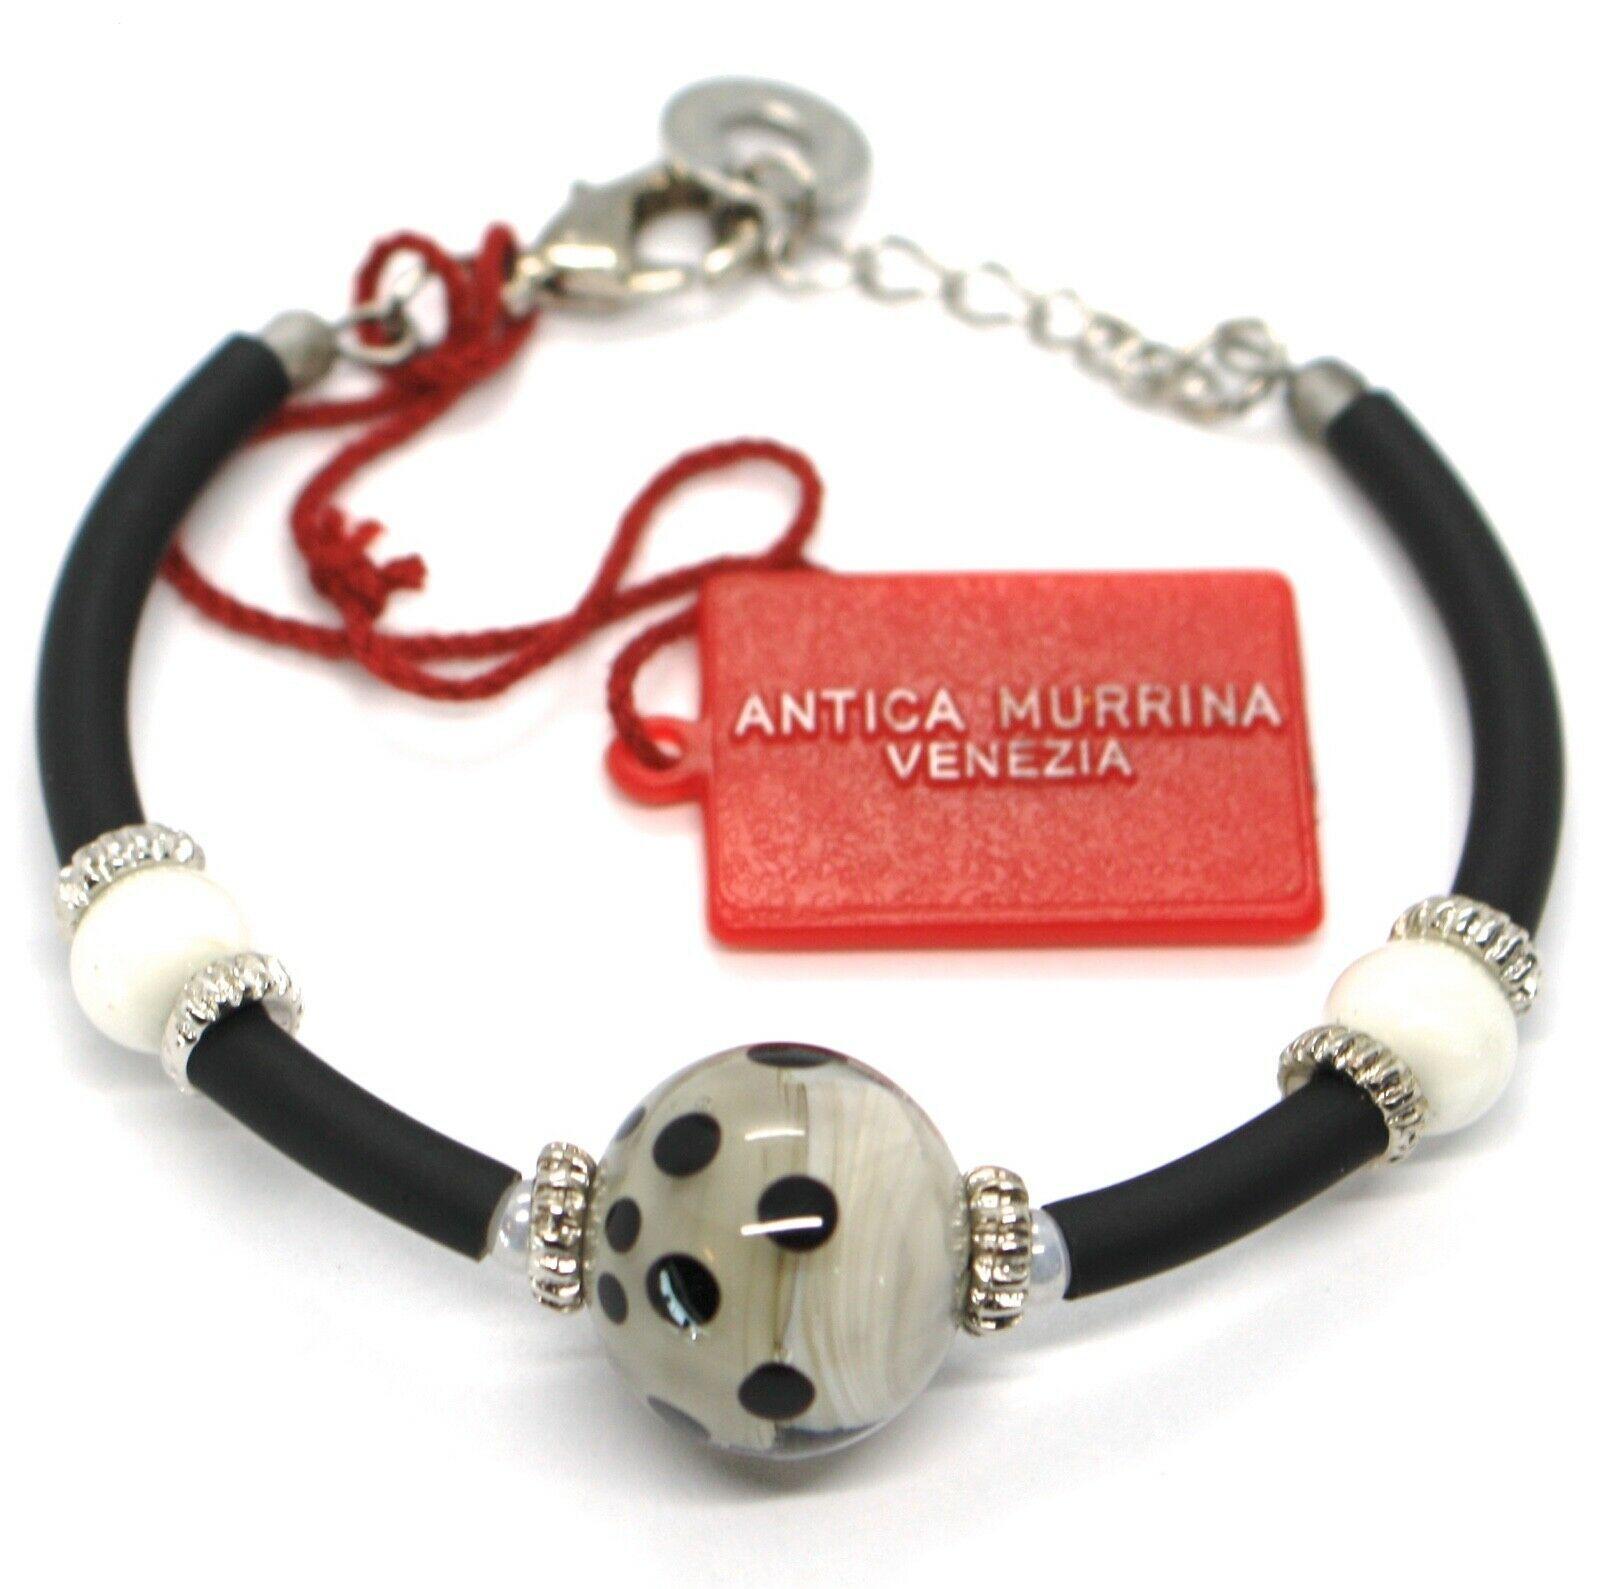 Bracelet Antica Murrina Venezia  BR718A14 Black White,Sphere Polka